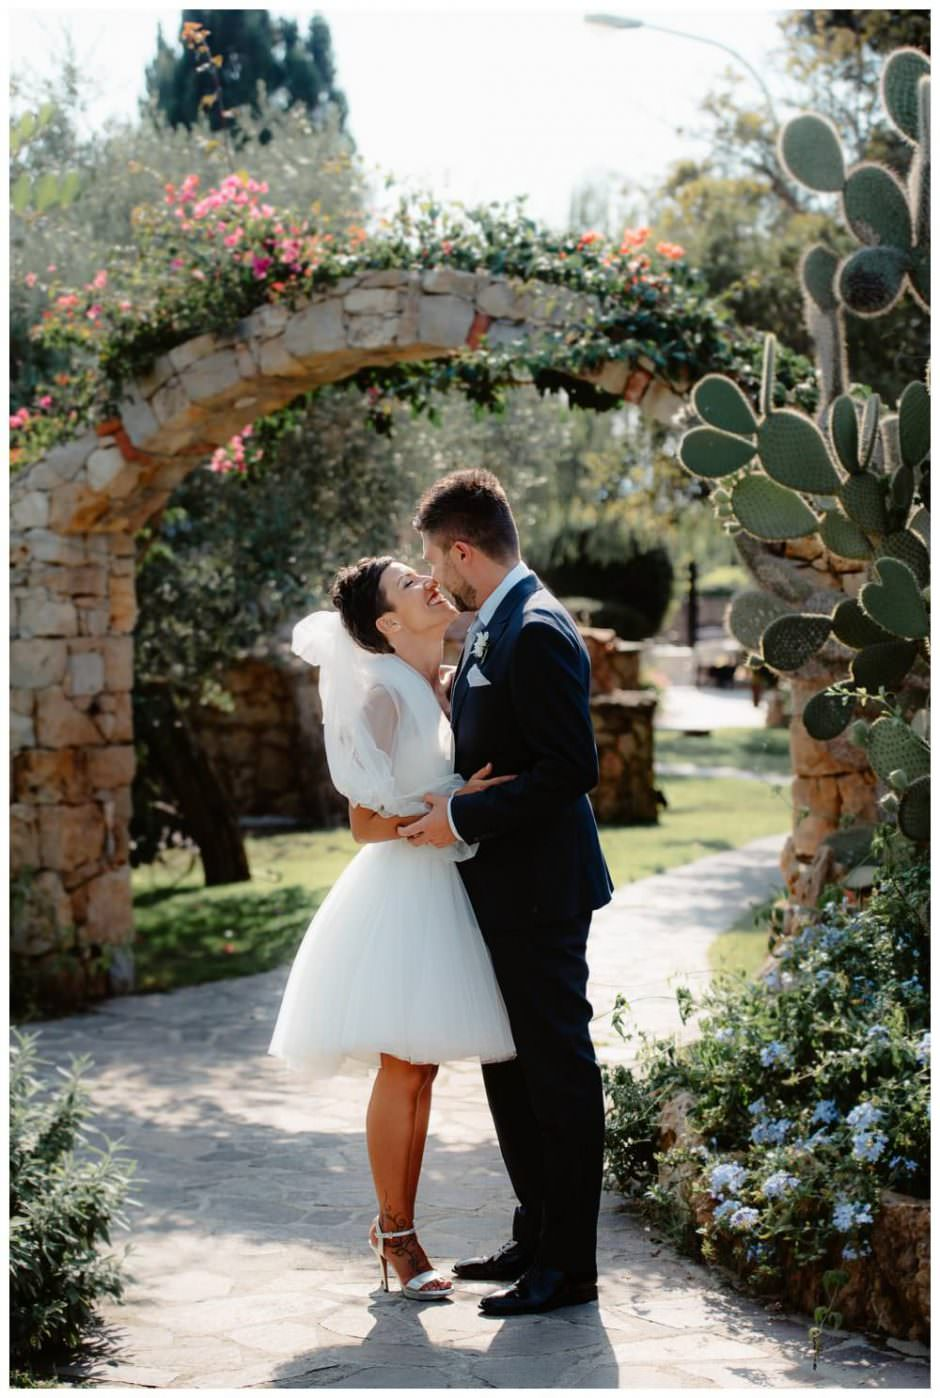 matrimonio-alghero-samandra-47-di-74